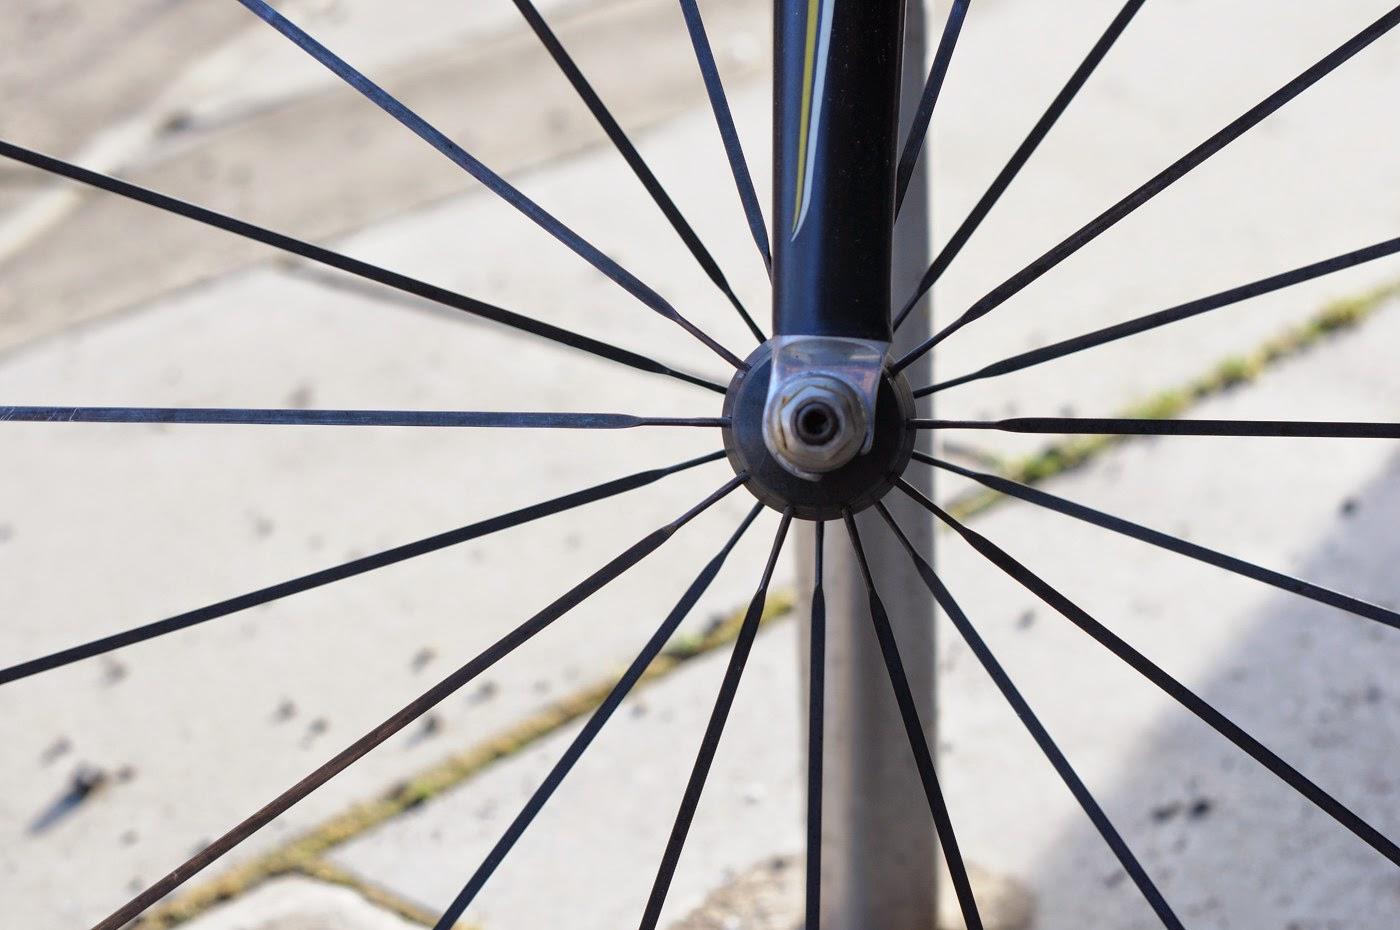 avanti, track, frame, pista pro, bespoke, fixie, bicycle, the biketorialist, tim Macauley, custom, customised, north terrace, Adelaide, blog, bike, fixed speed, shimano, mavic, fsa,